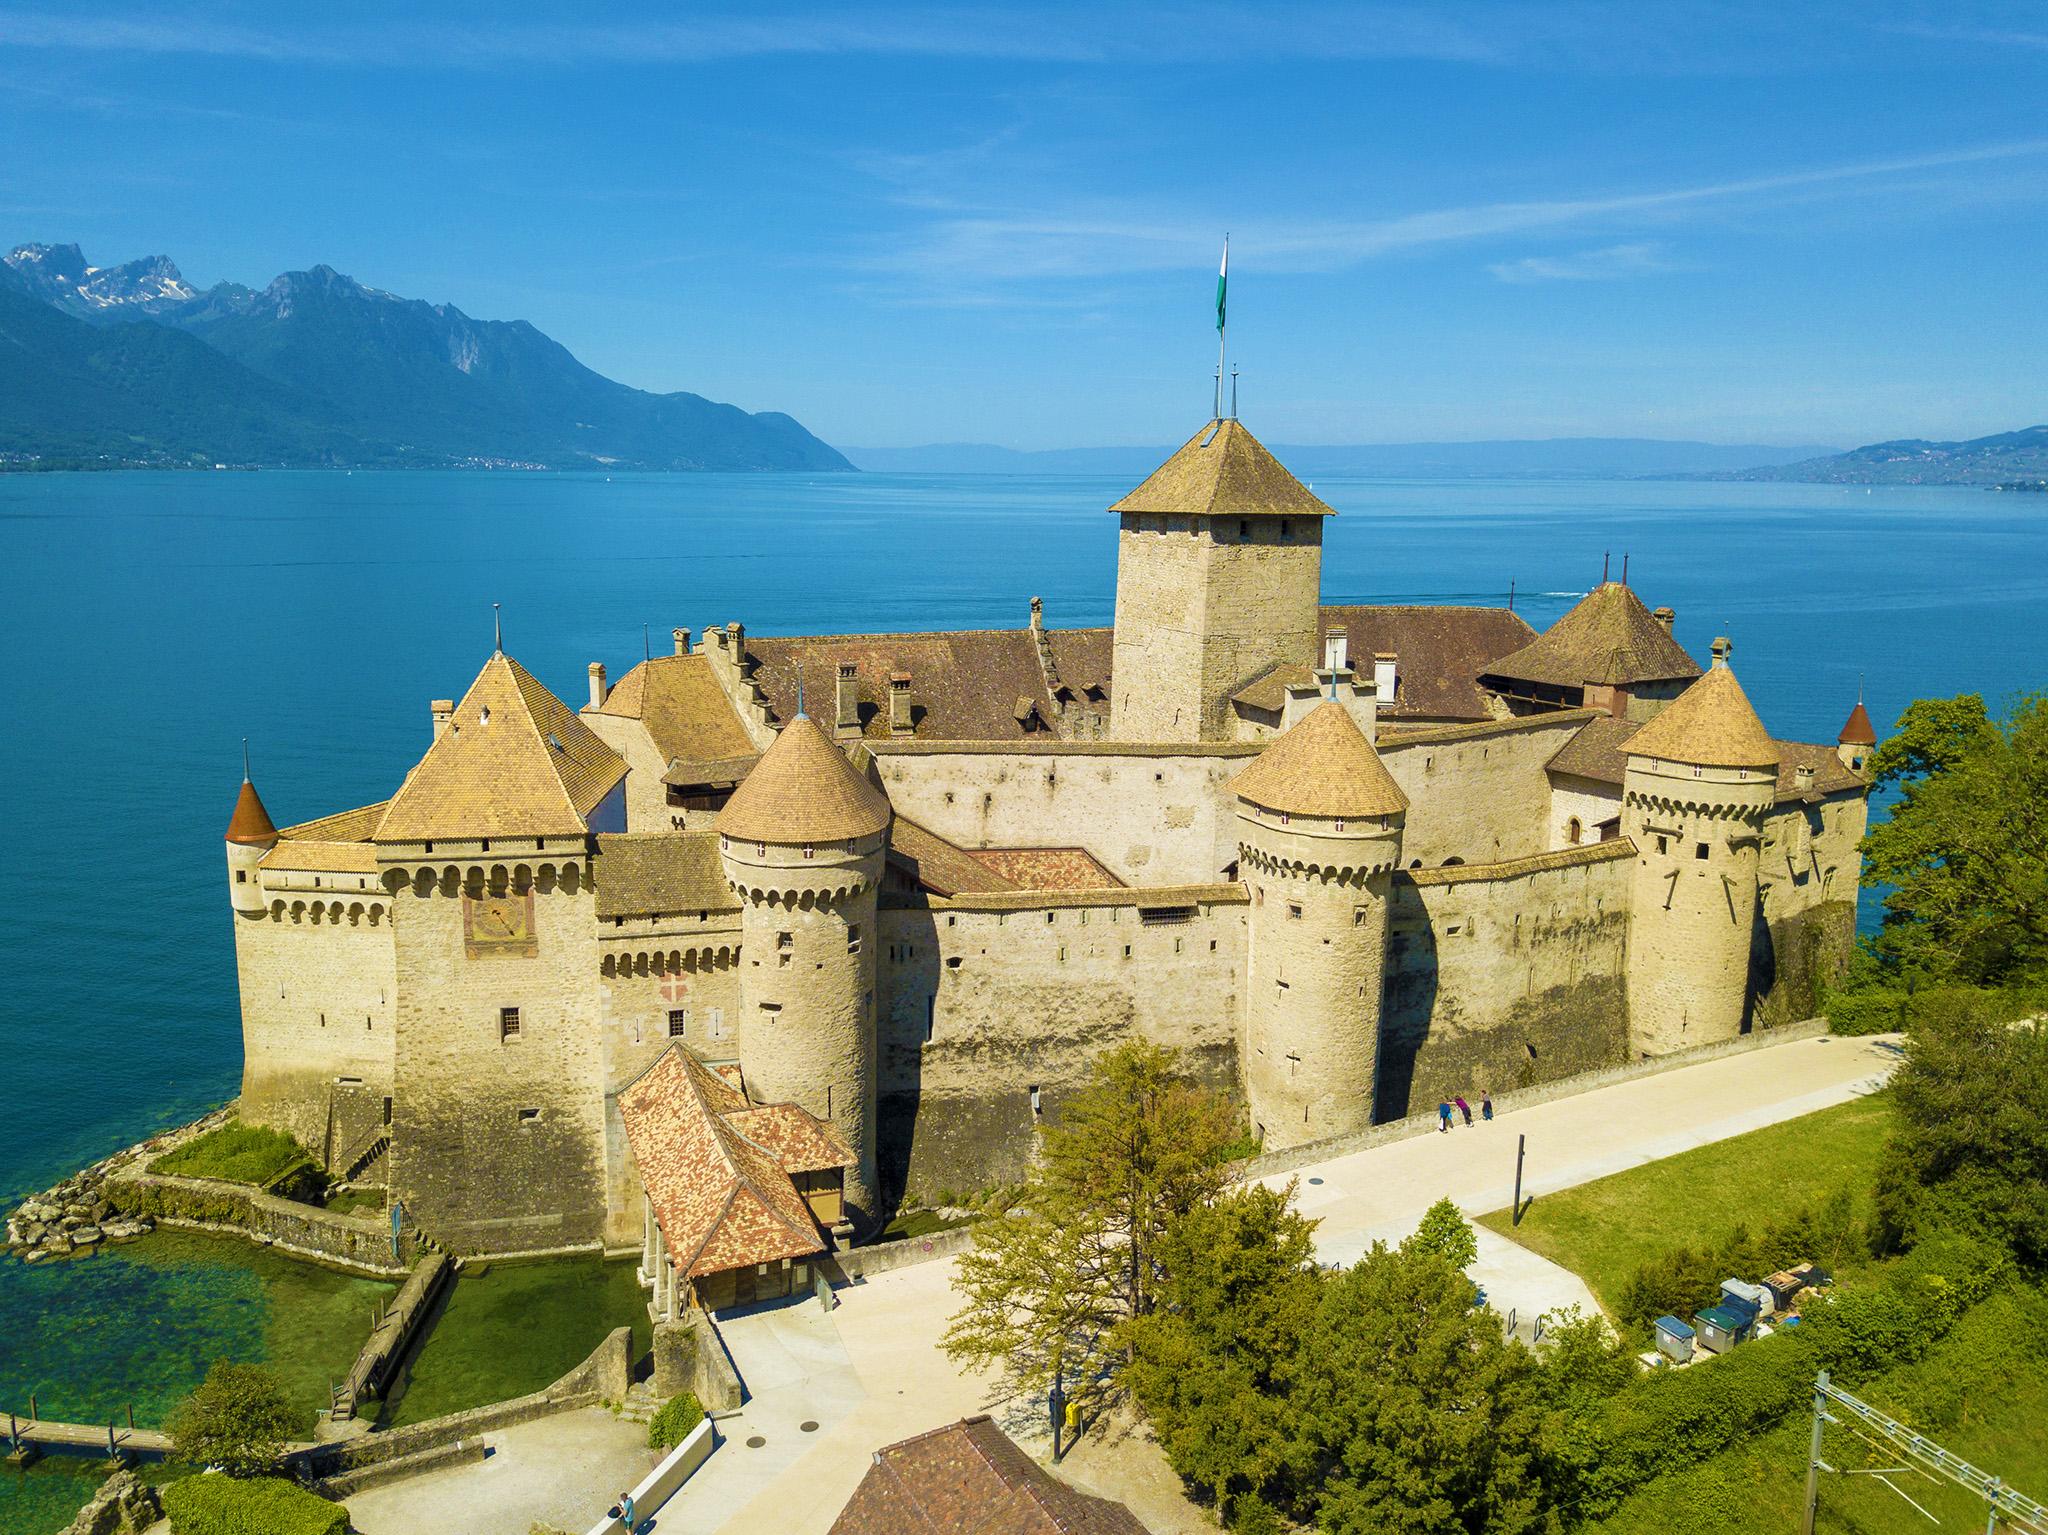 kt_2020_300_Keytours_excursions_Swisstours_chateau chillon32_2048_10